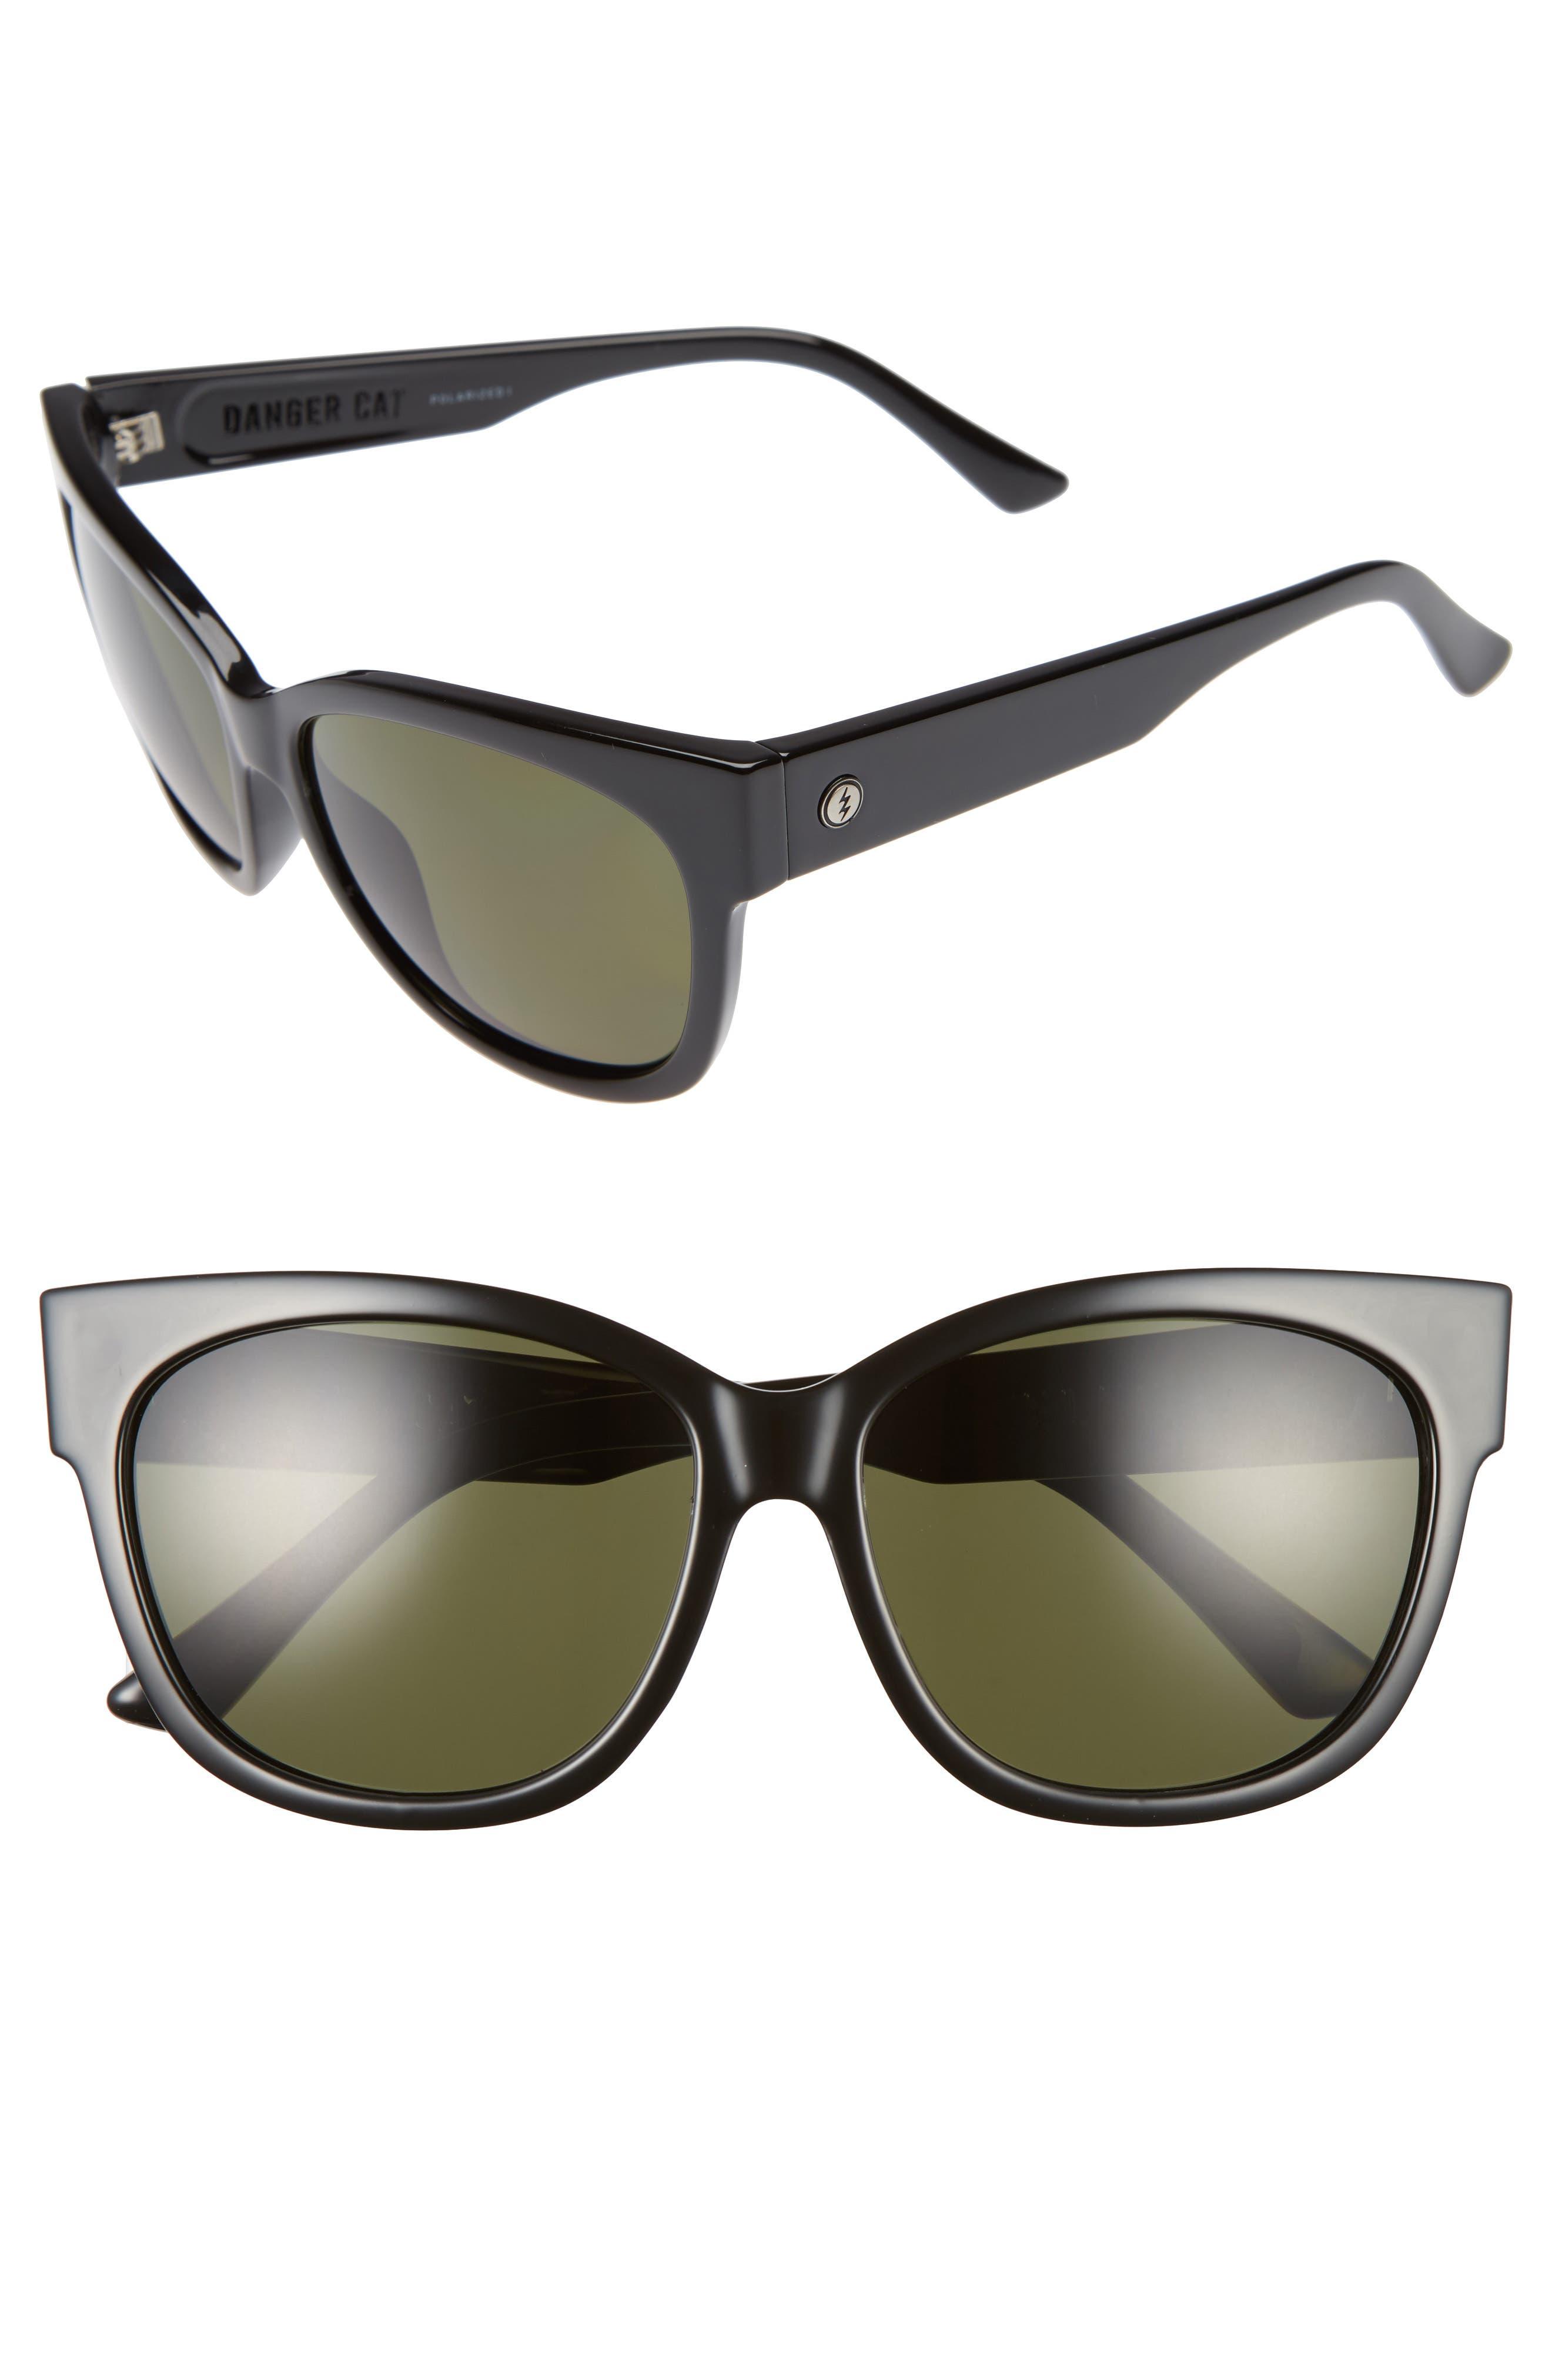 Danger Cat 58mm Sunglasses,                             Main thumbnail 1, color,                             001